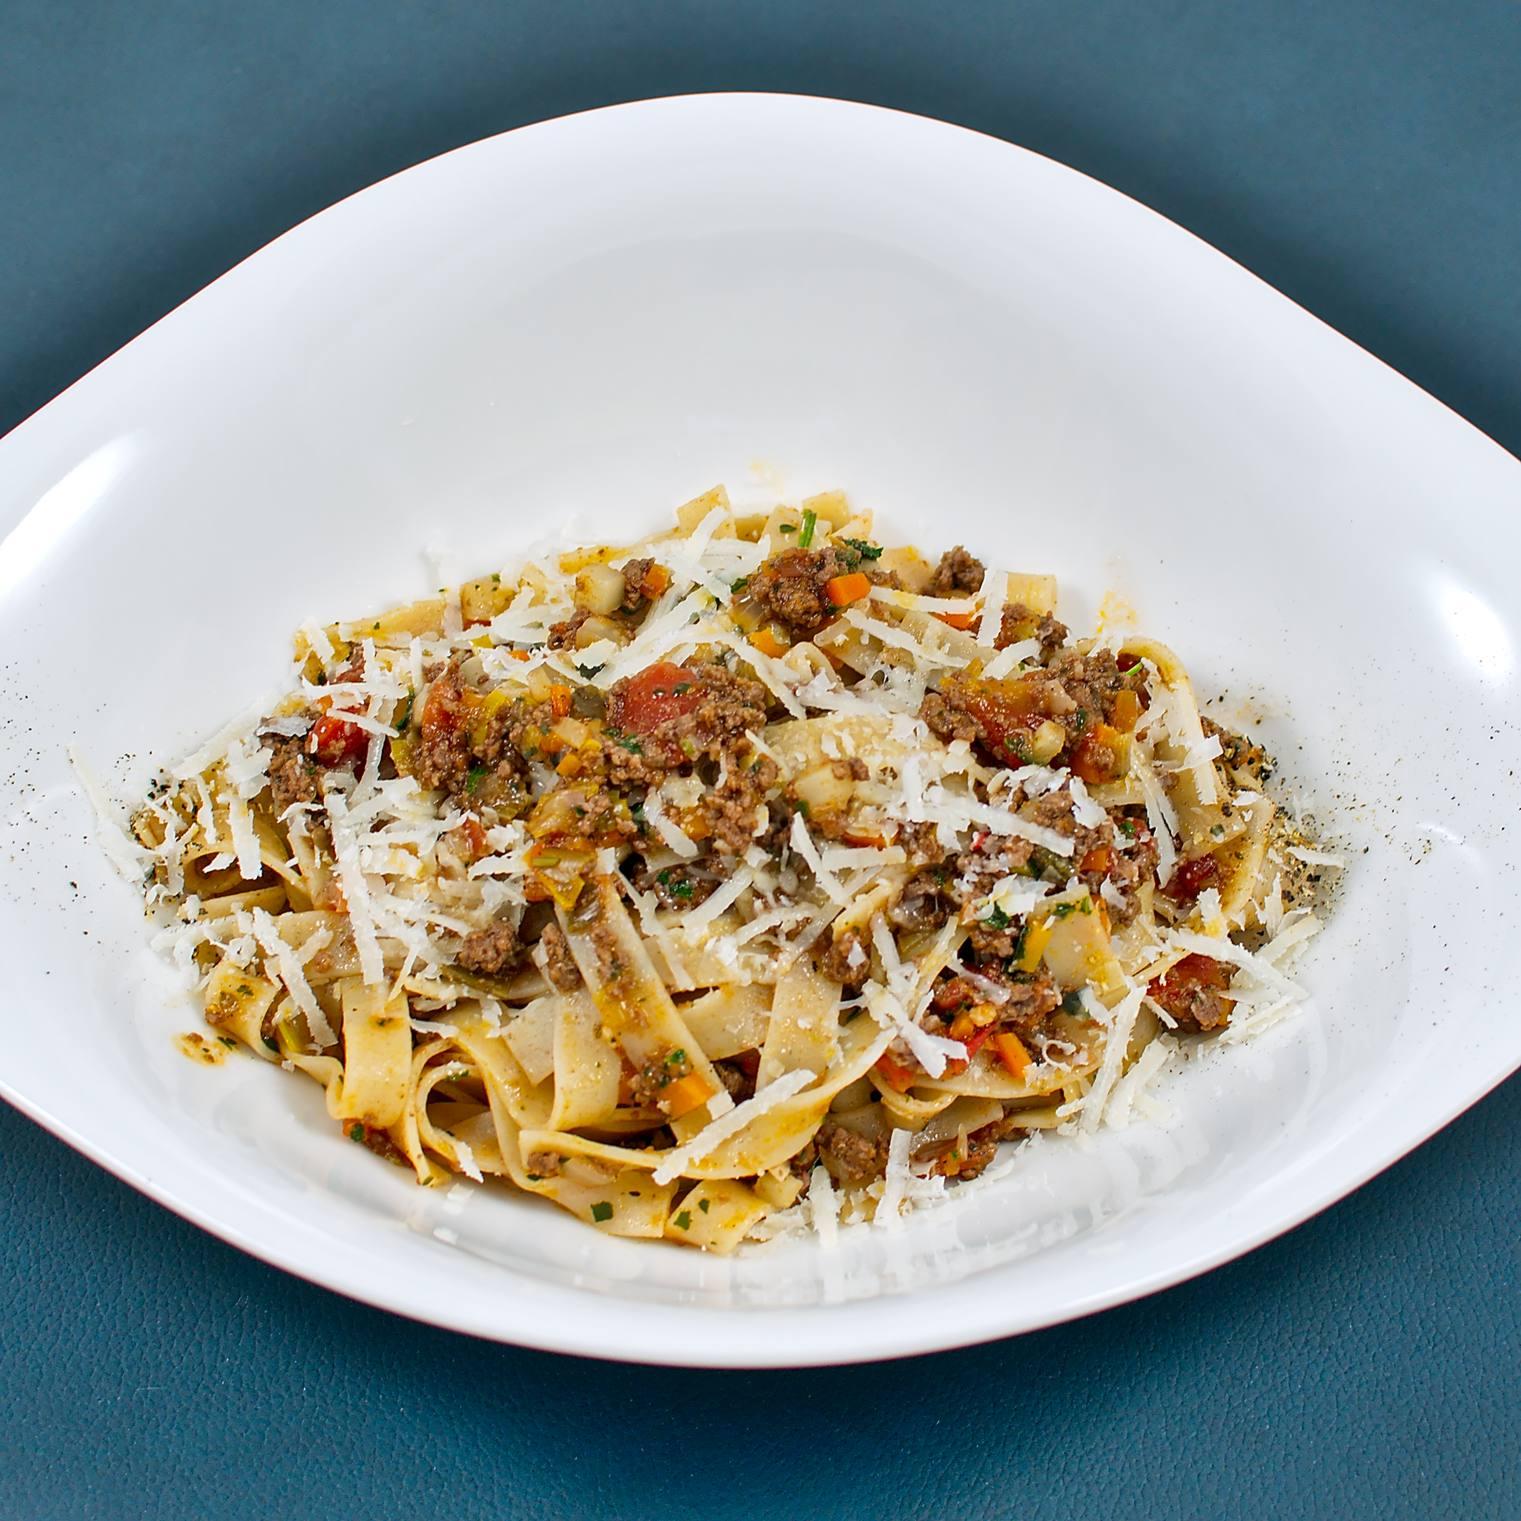 Reh-Ragout alla Bolognese | Tagliatelle | Parmesan